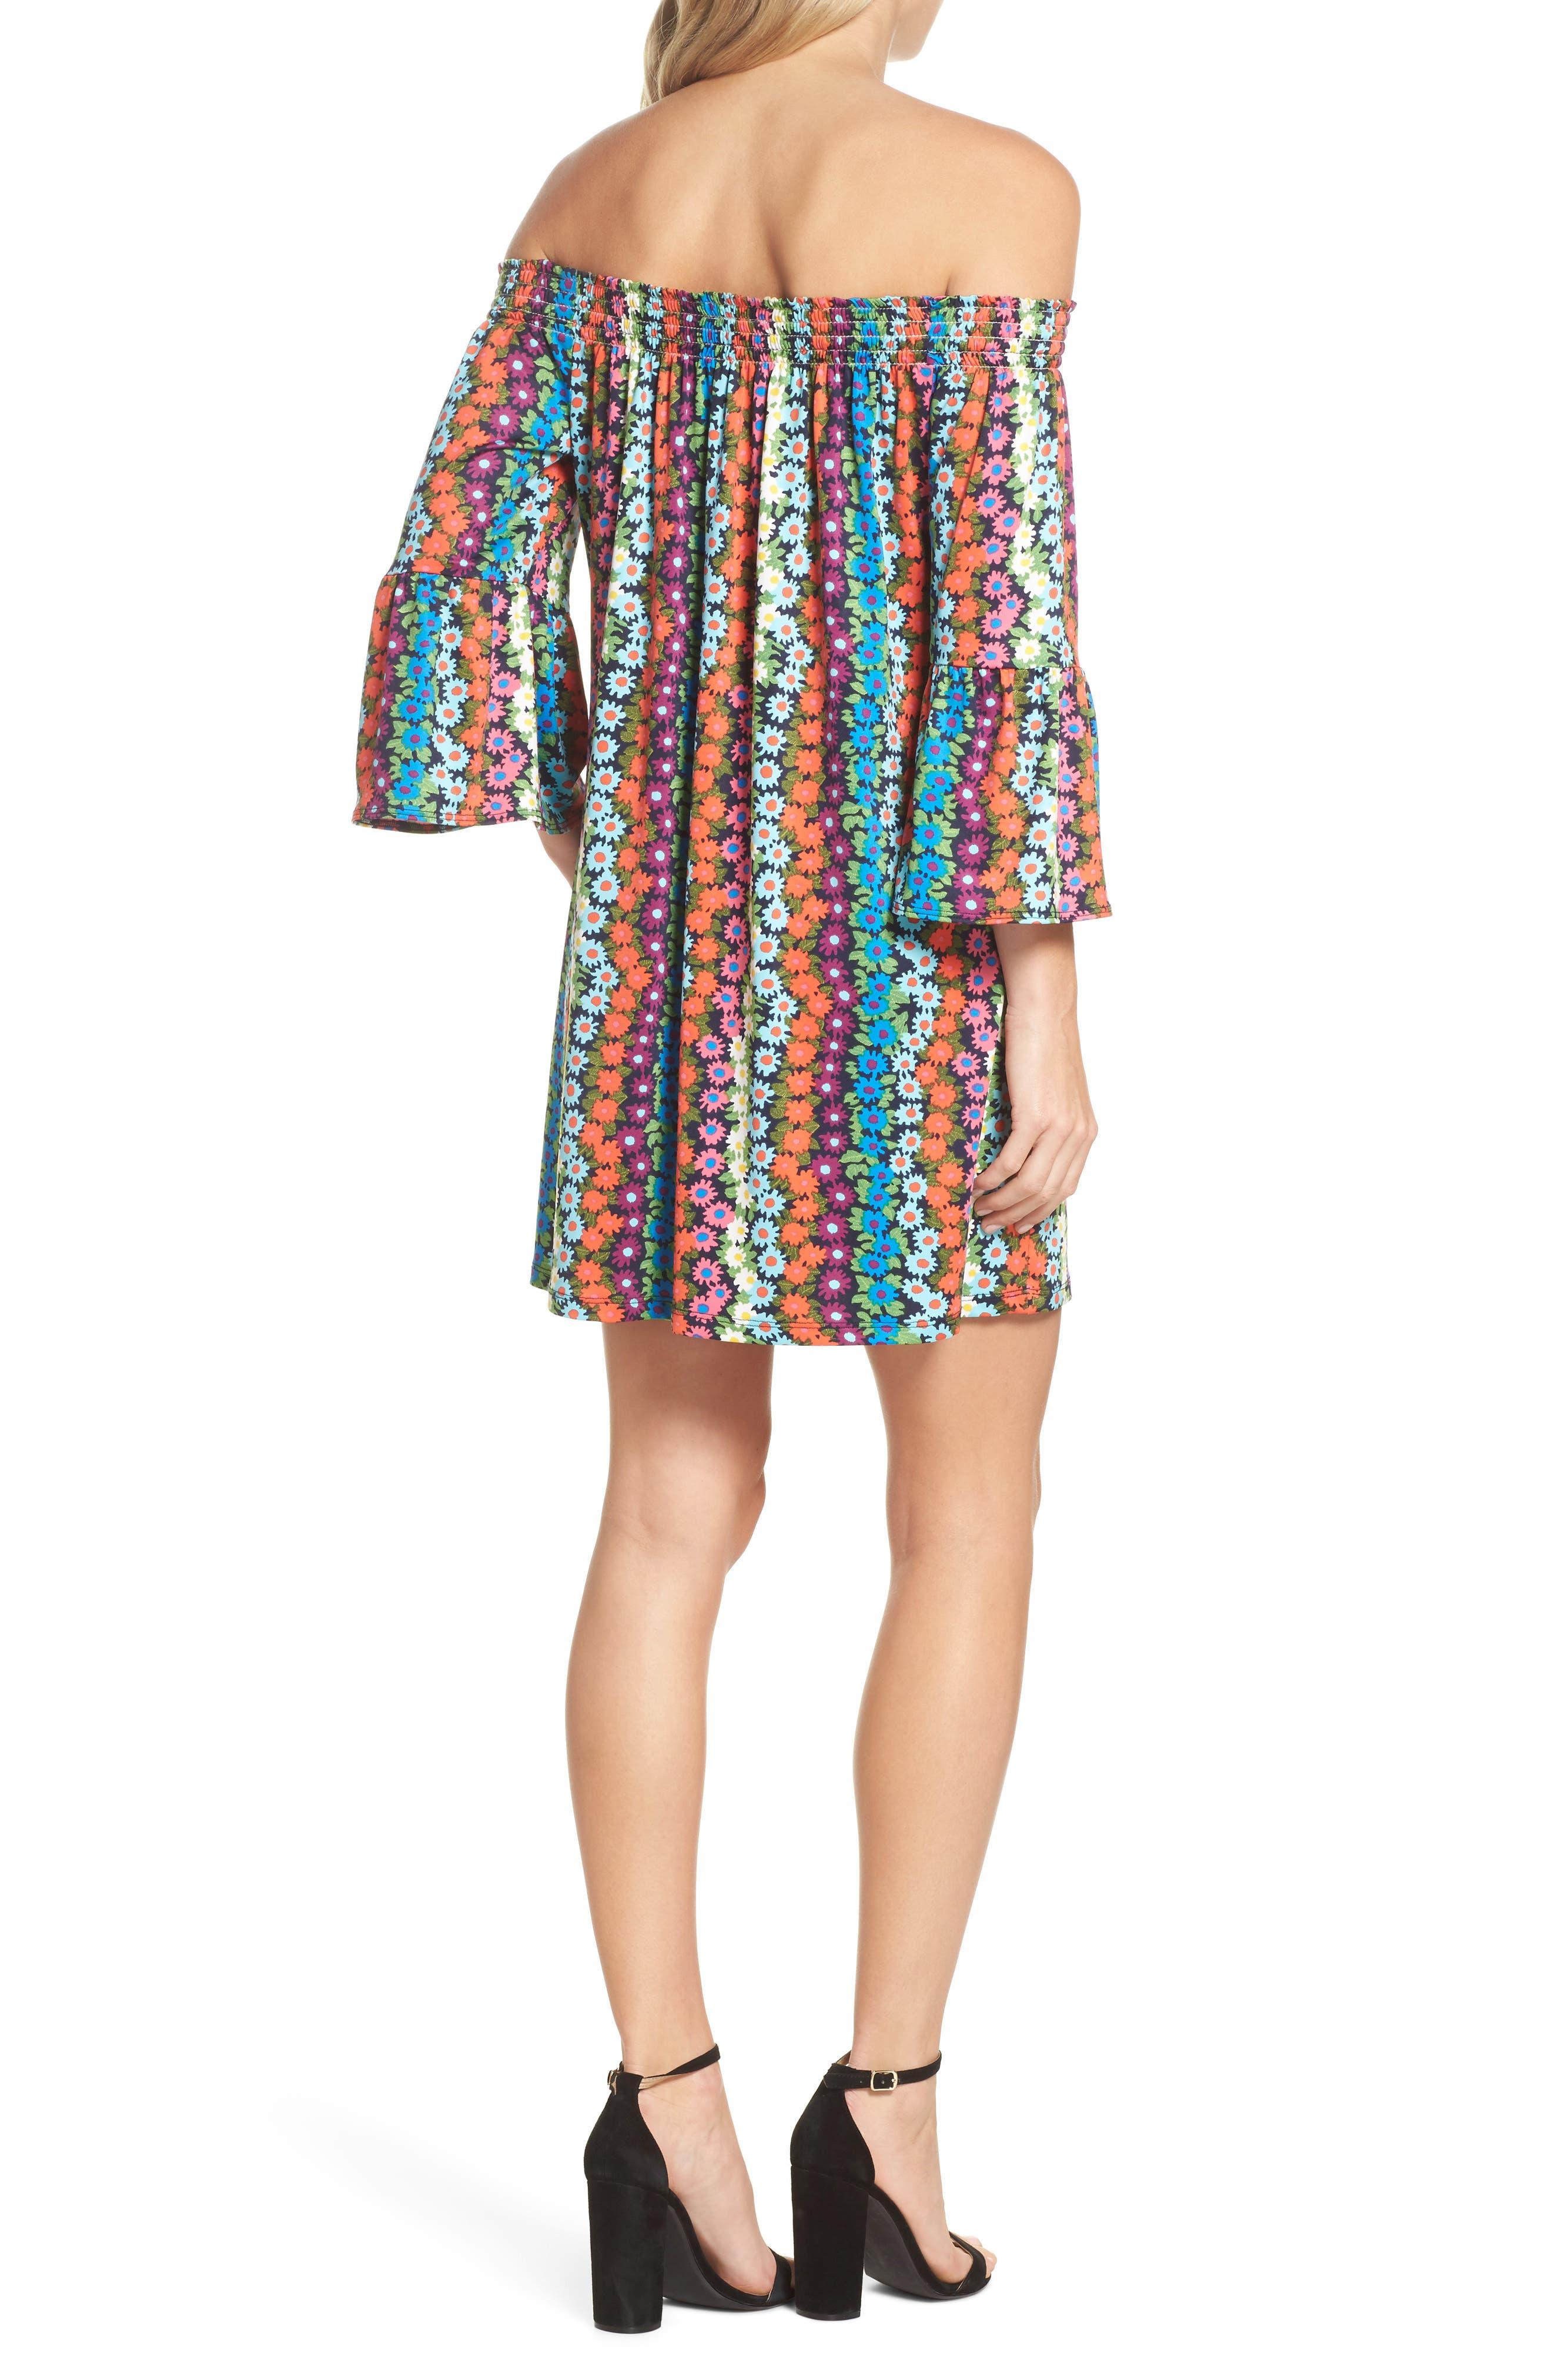 Trina Turk Off the Shoulder Bell Sleeve Dress,                             Alternate thumbnail 2, color,                             Multi